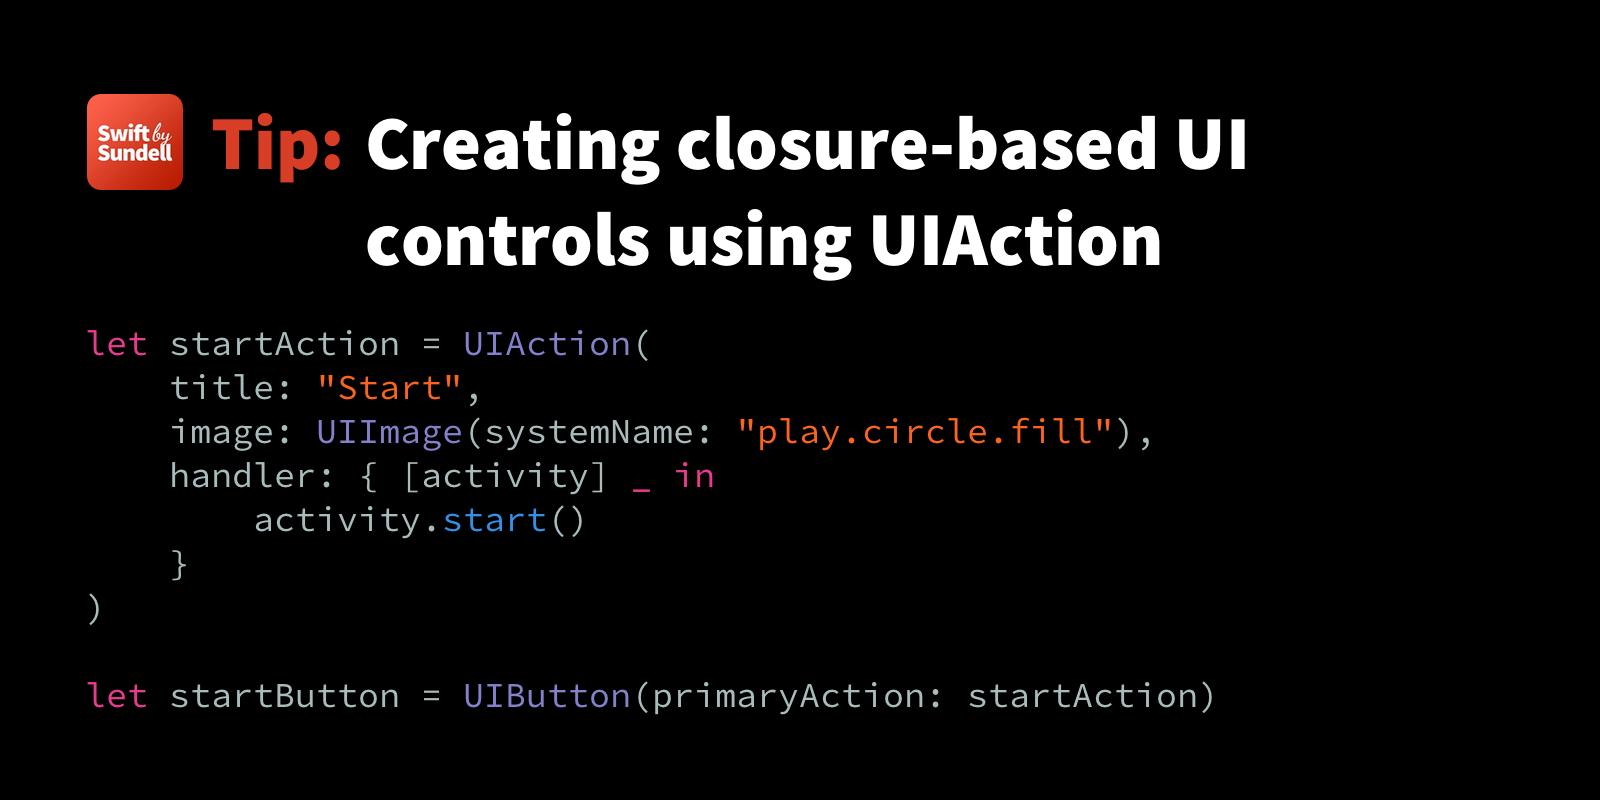 Creating closure-based UI controls using UIAction